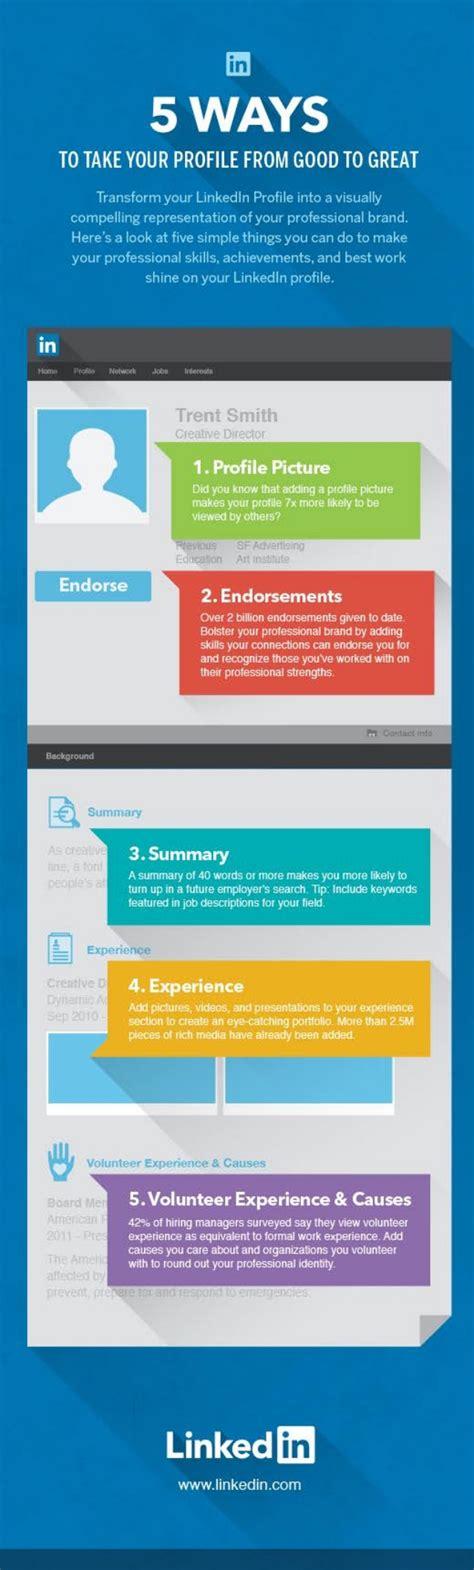 5 tips for linkedin profile